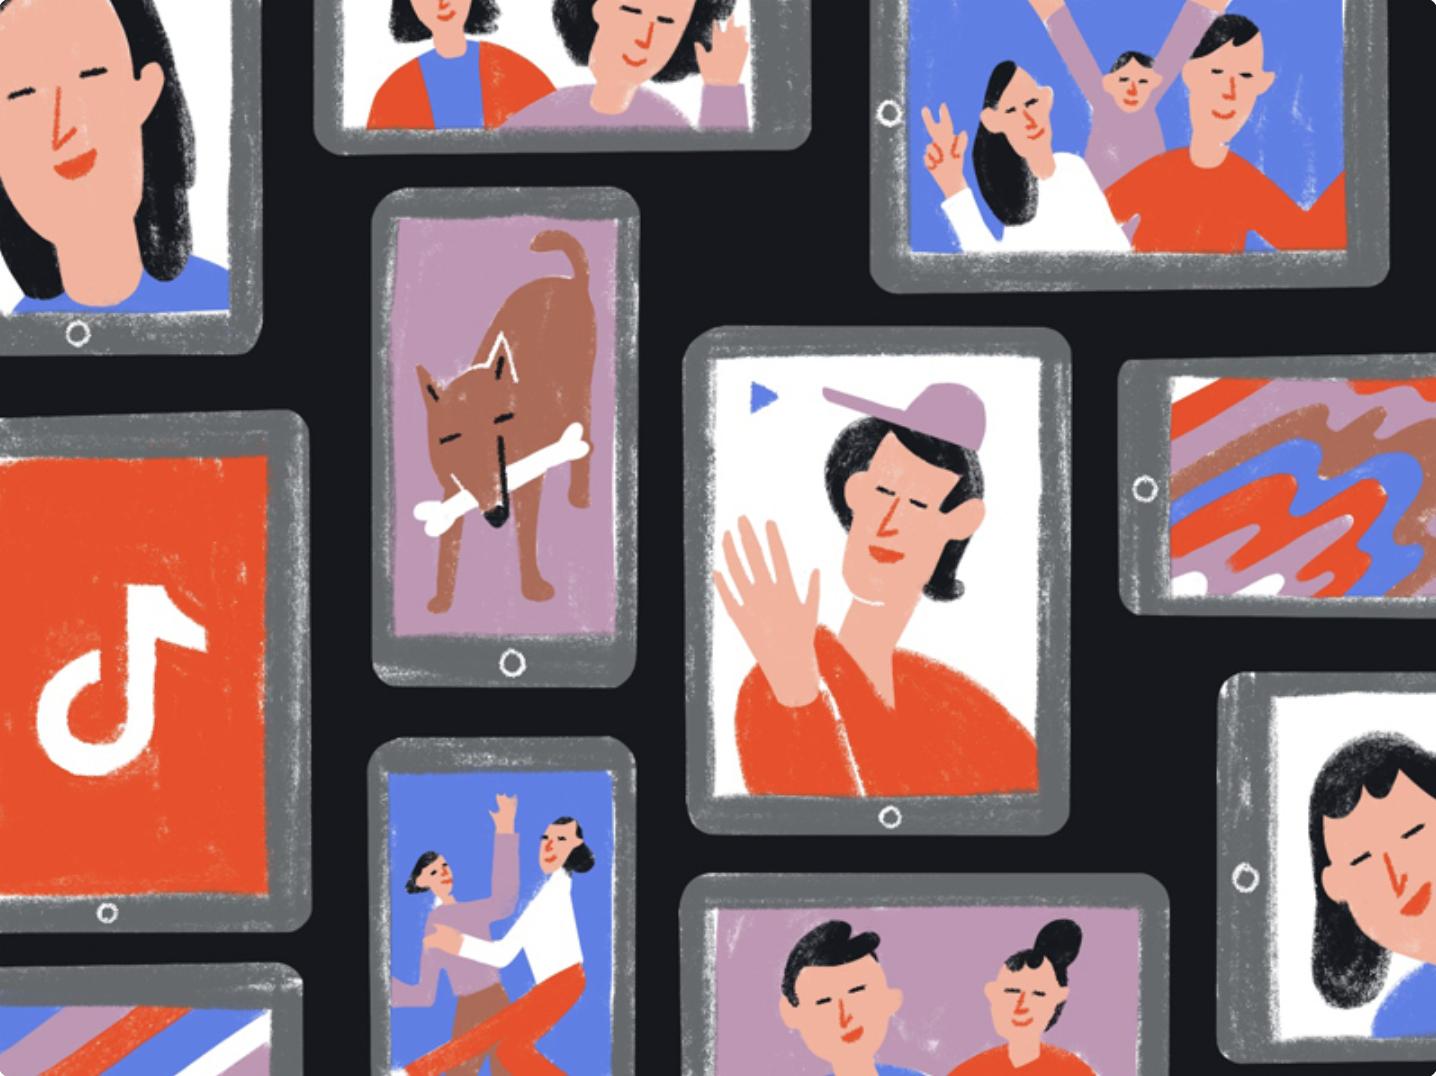 How Brands Are Reaching Gen Z on TikTok